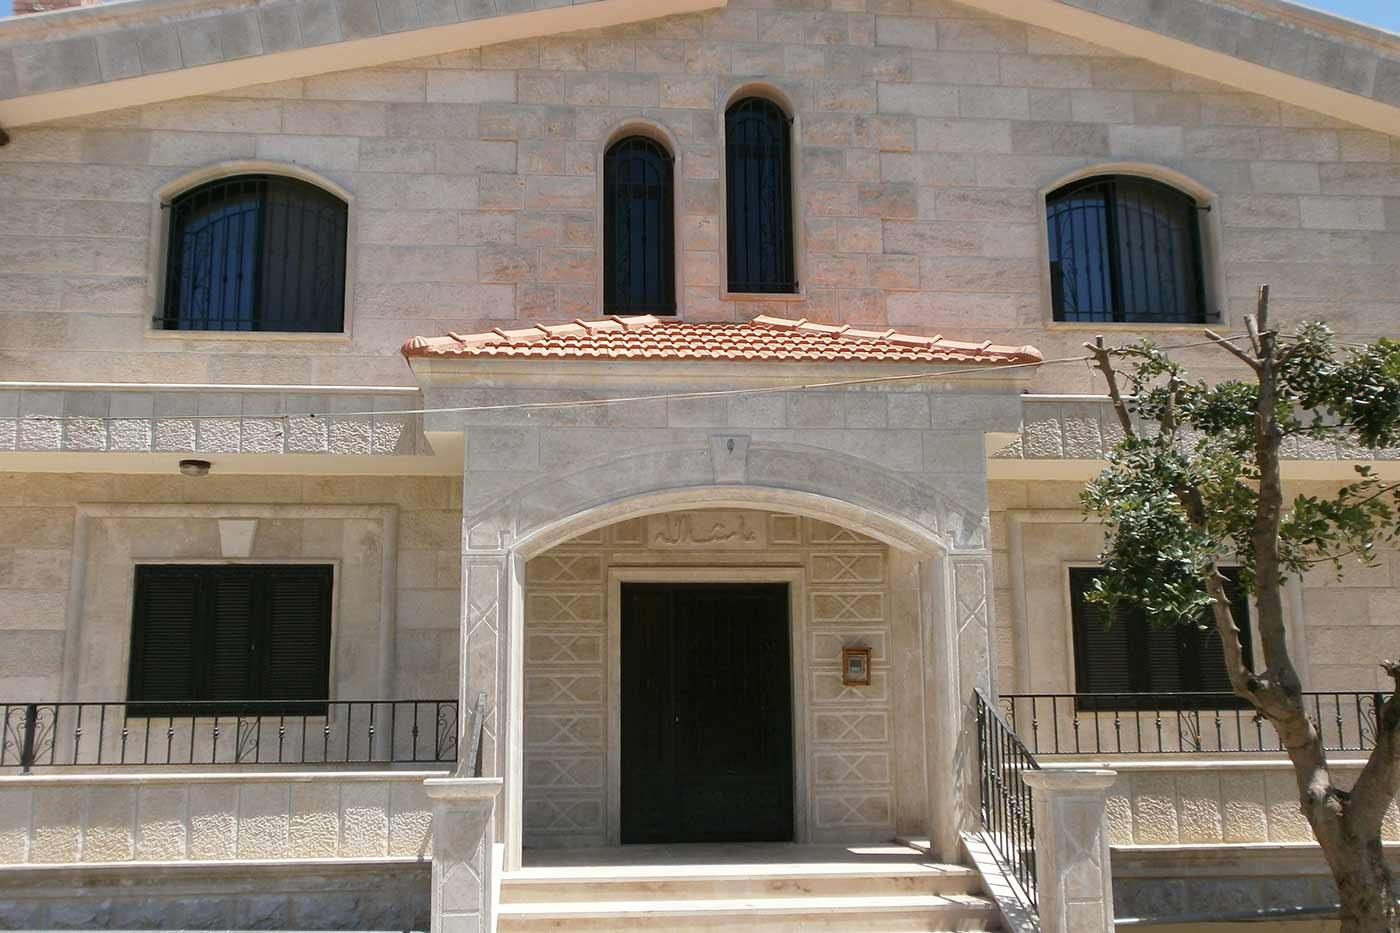 Merhi Villa - Front View Entrance